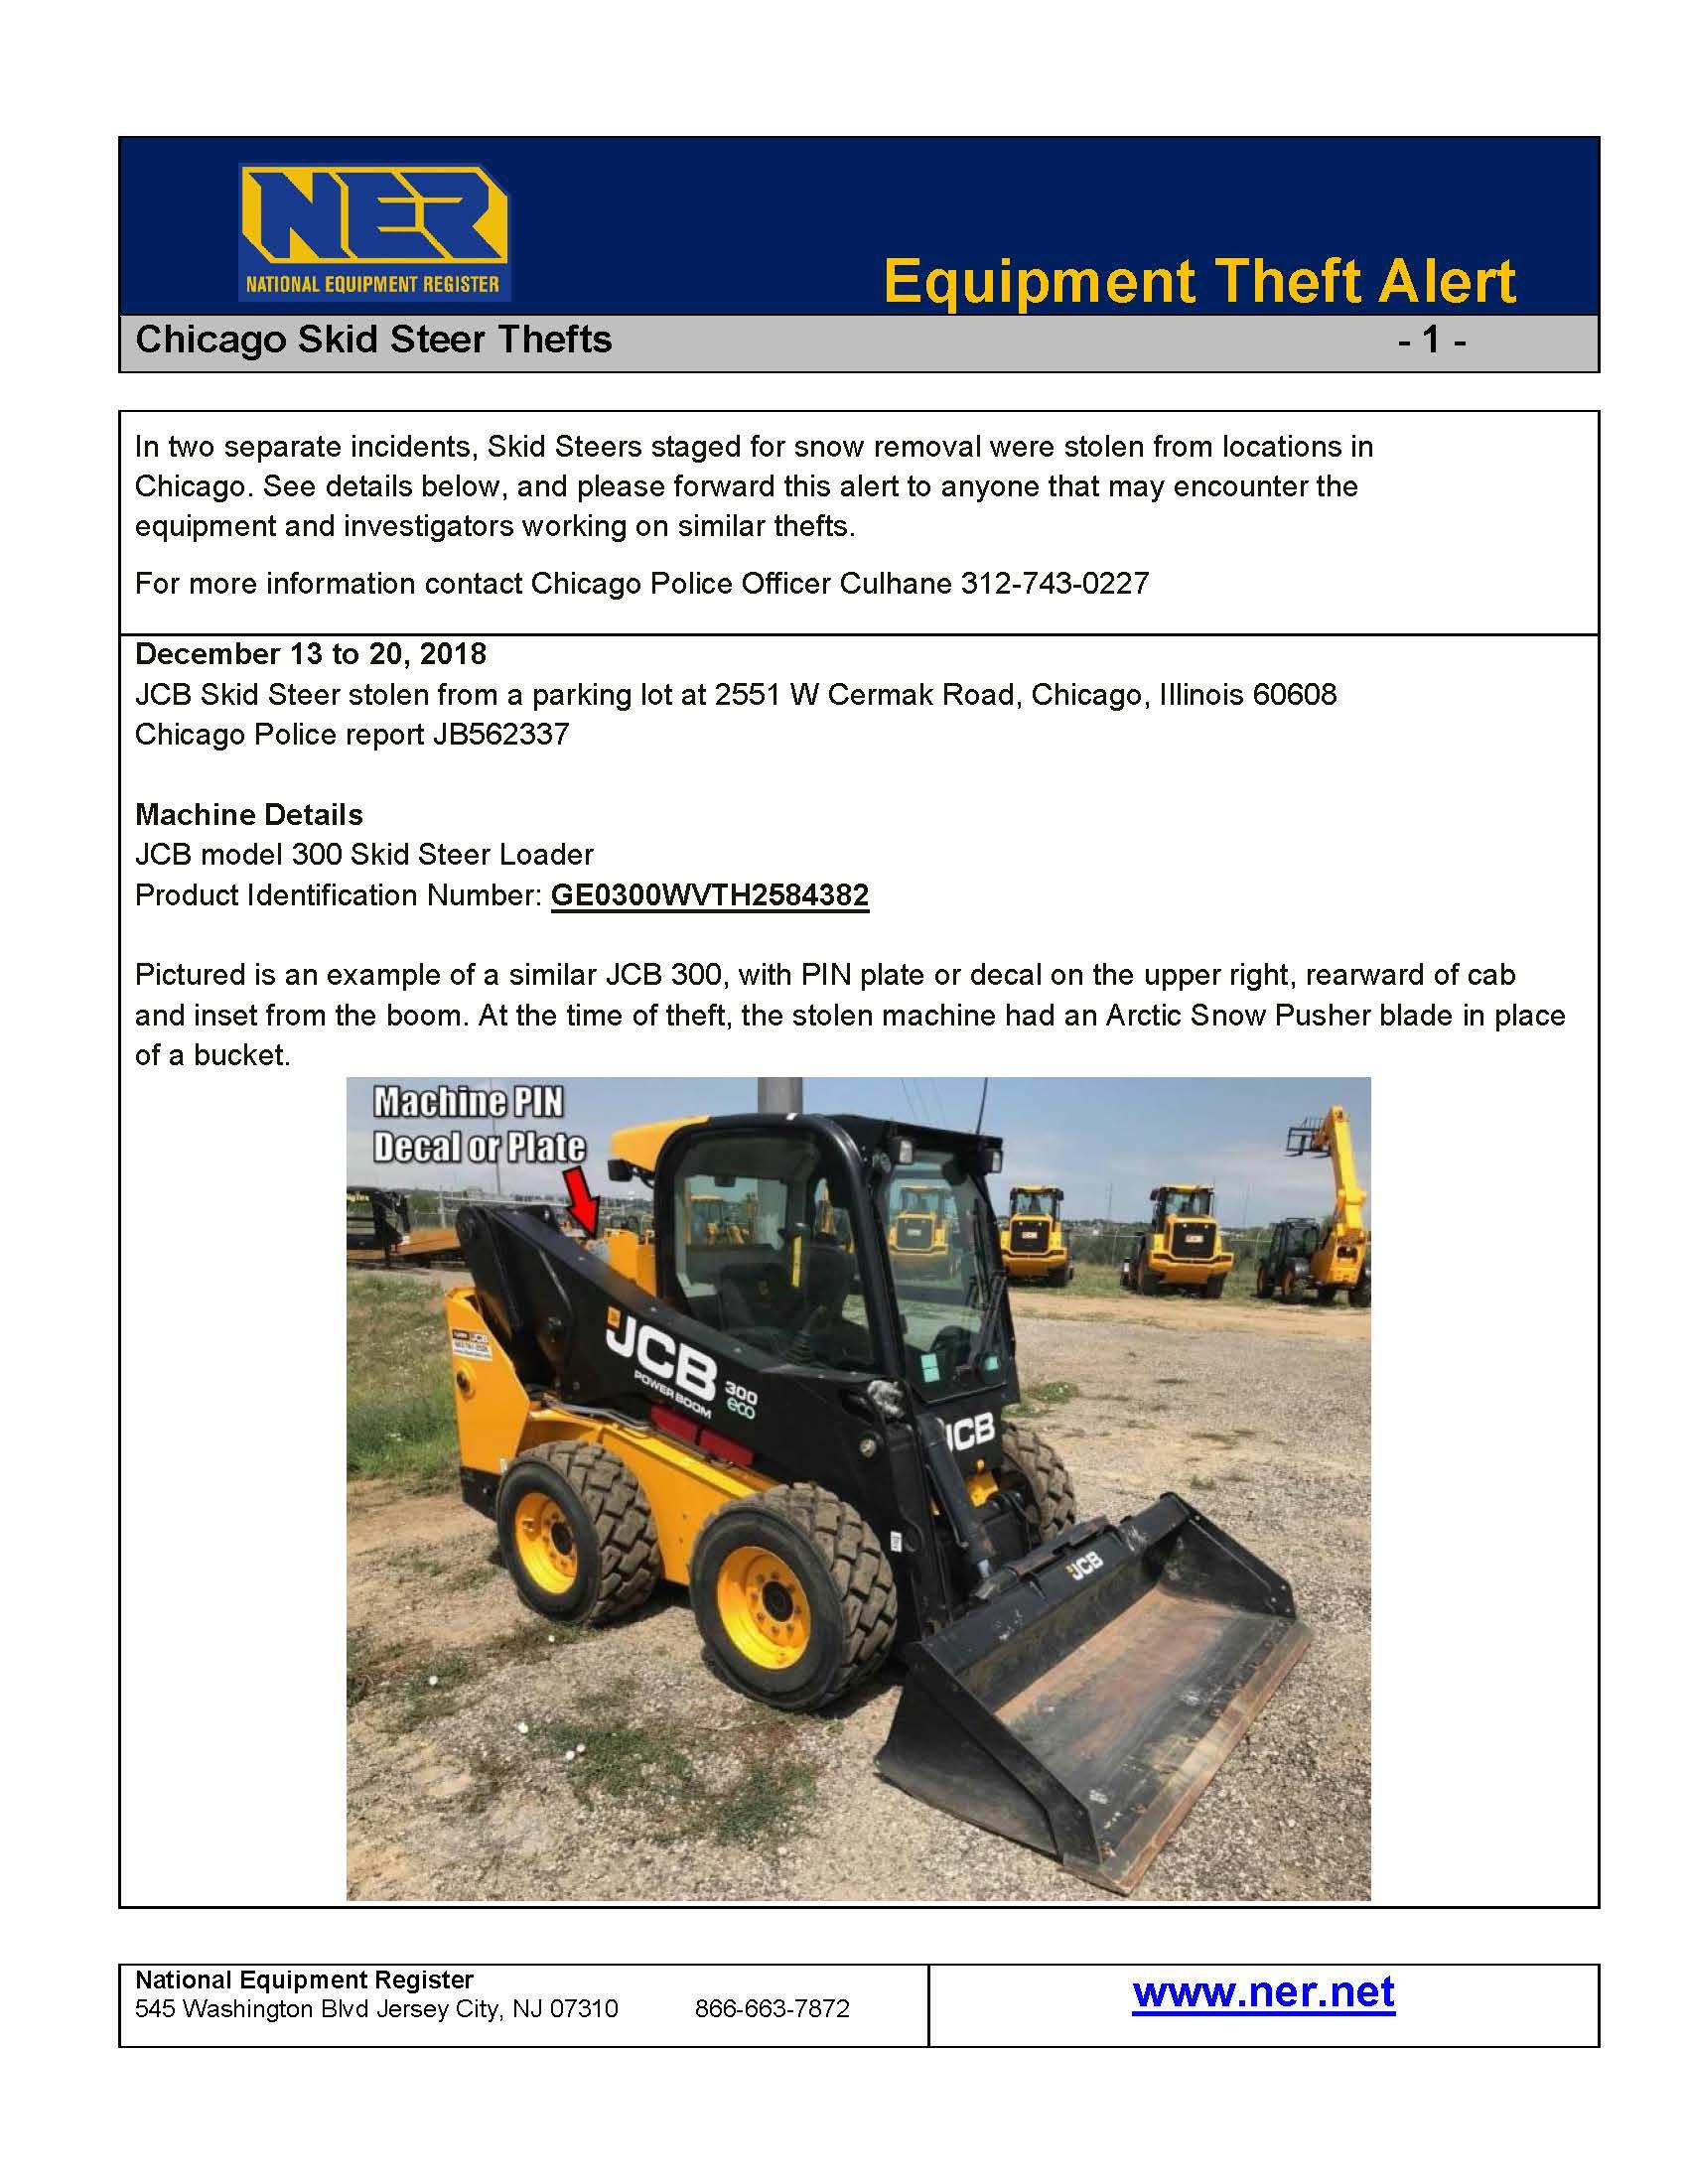 Theft Alerts | National Equipment Register (NER)